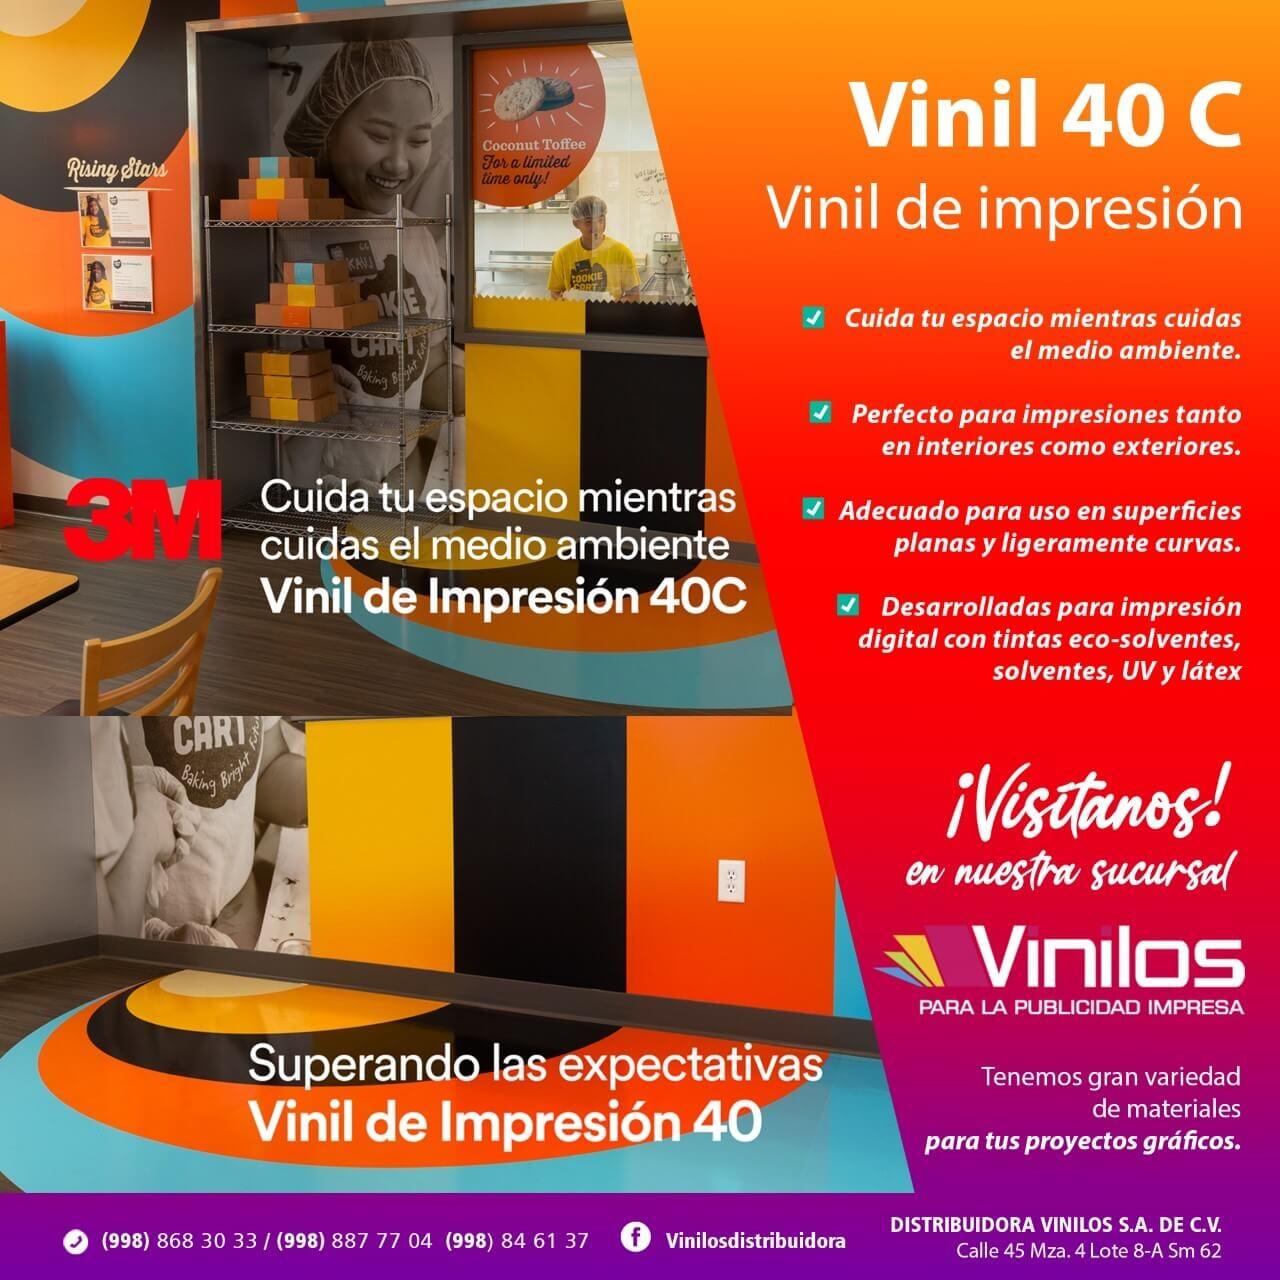 VINILOS - Vinil 40 C